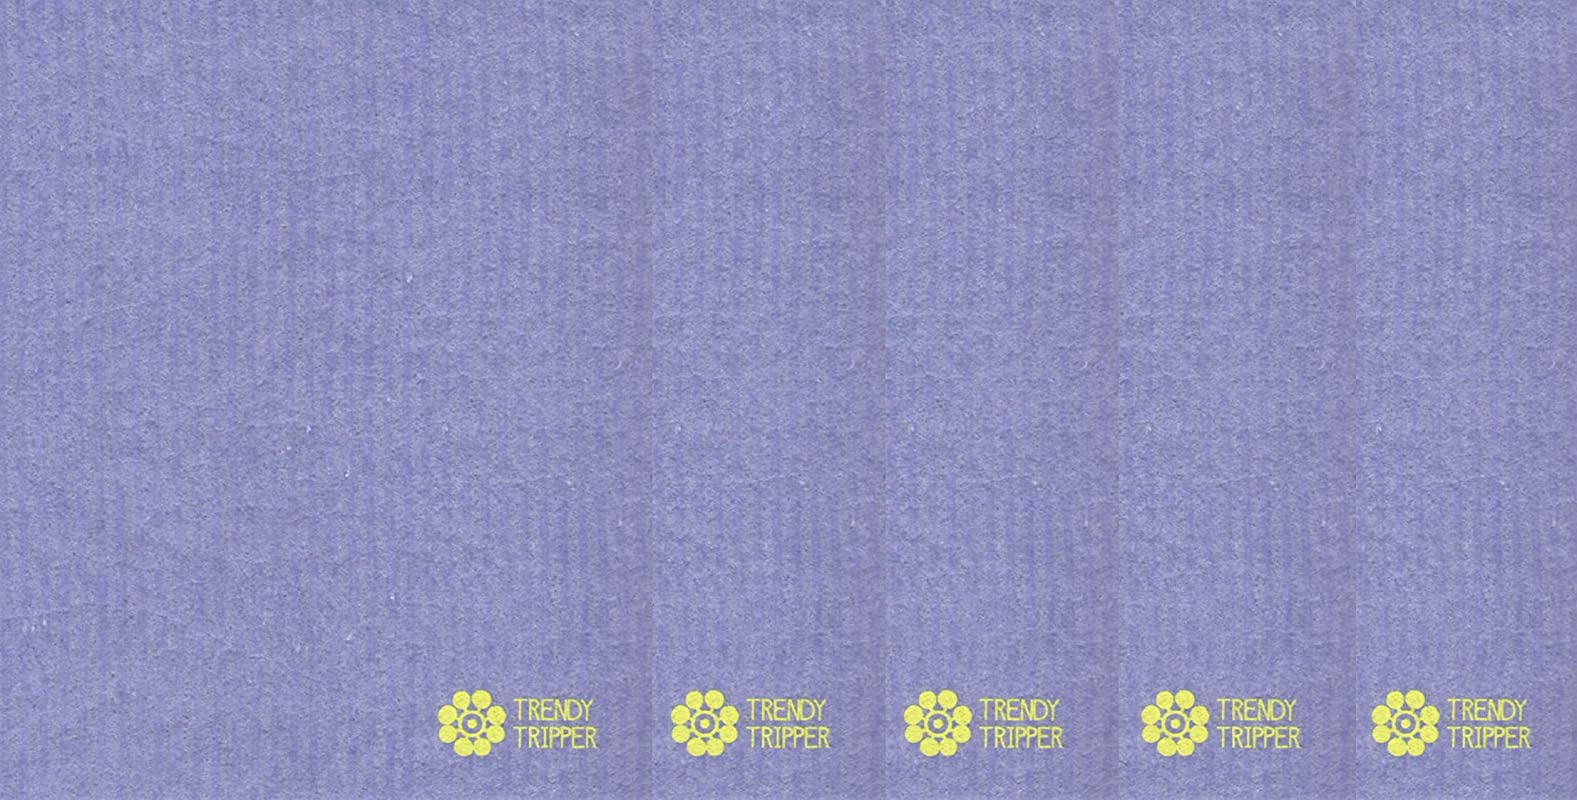 Trendy Tripper Swedish Dishcloths Reusable Set Of 5 Mixed Solid Colors FIVE 5 PURPLE